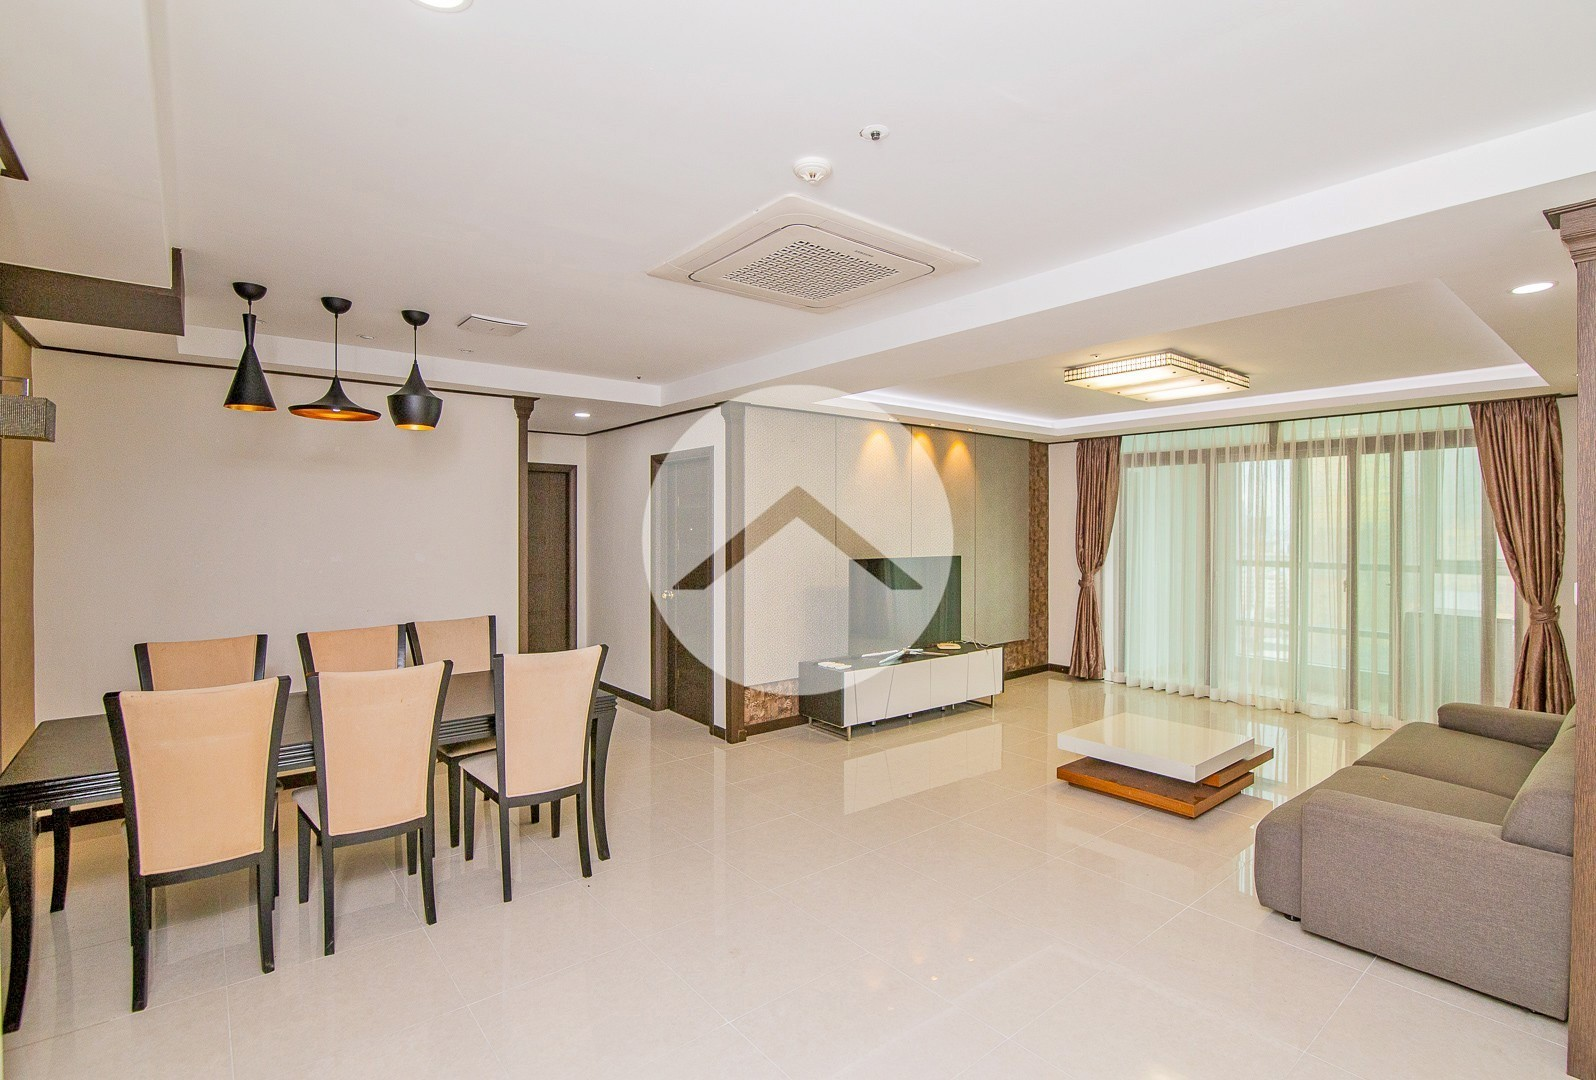 3 Bedroom Condo For Rent - Decastle Royal, Phnom Penh